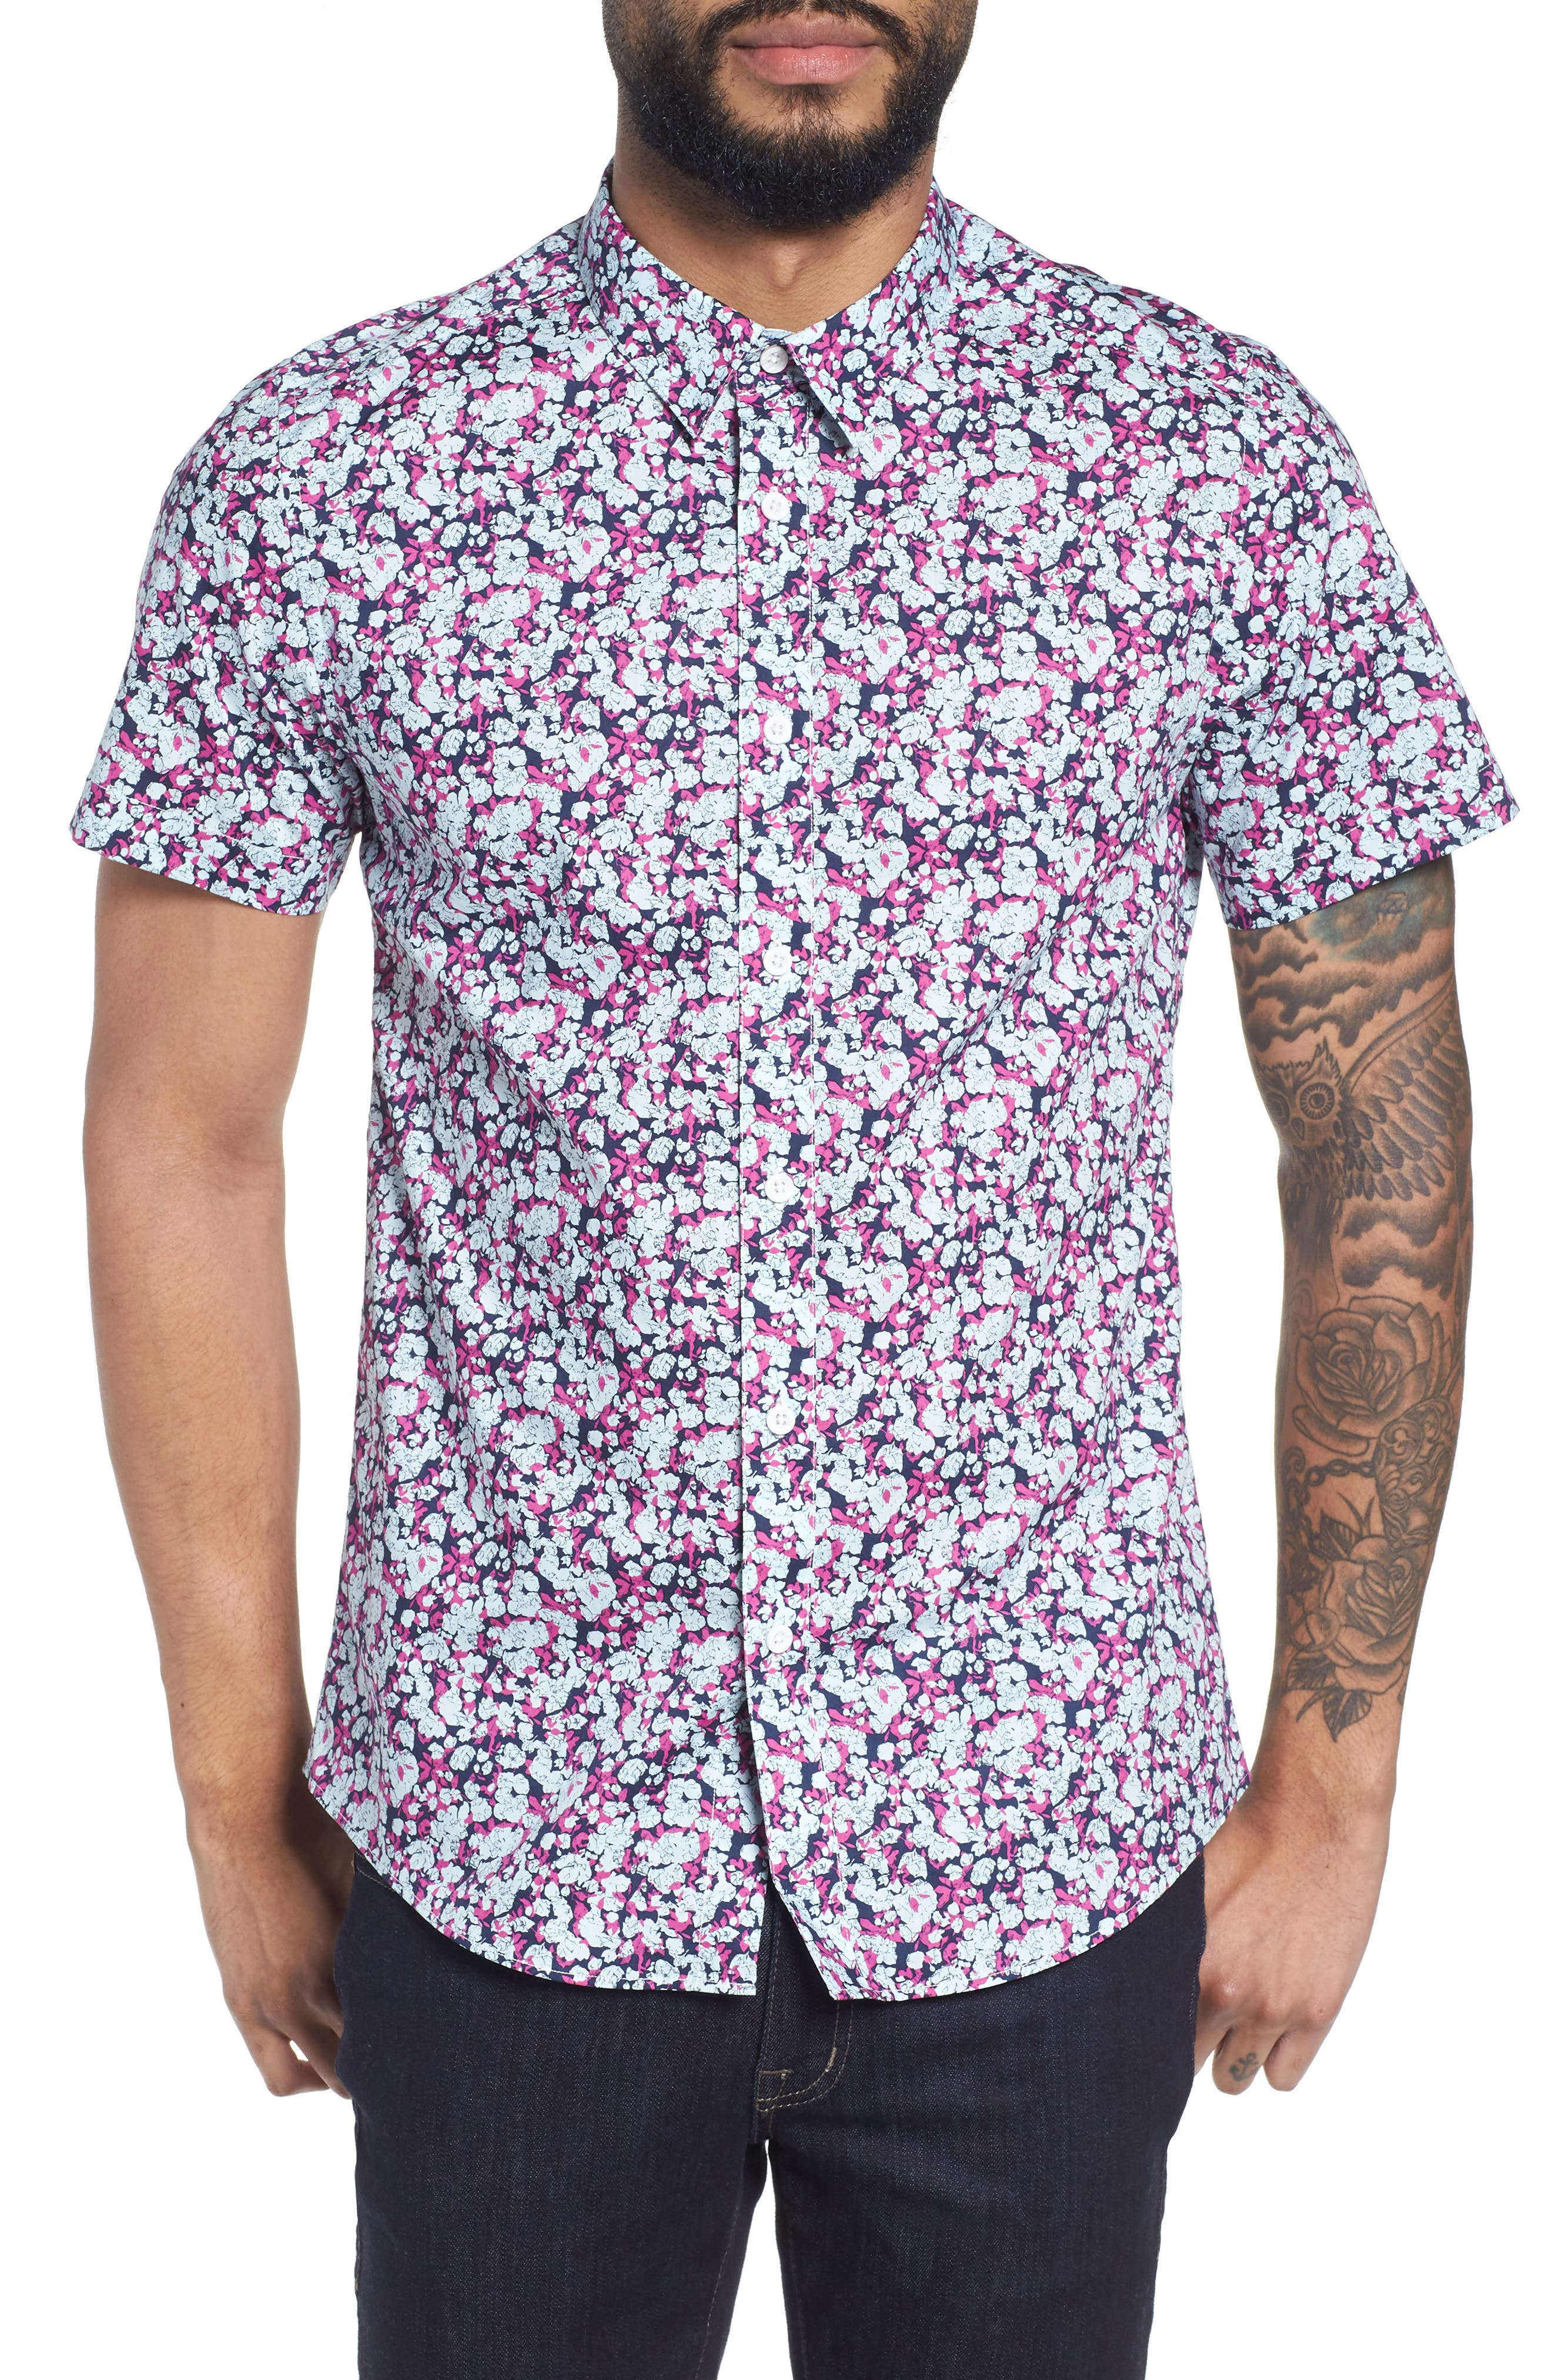 TWENTYMETRICTONS Print Woven Short Sleeve Shirt